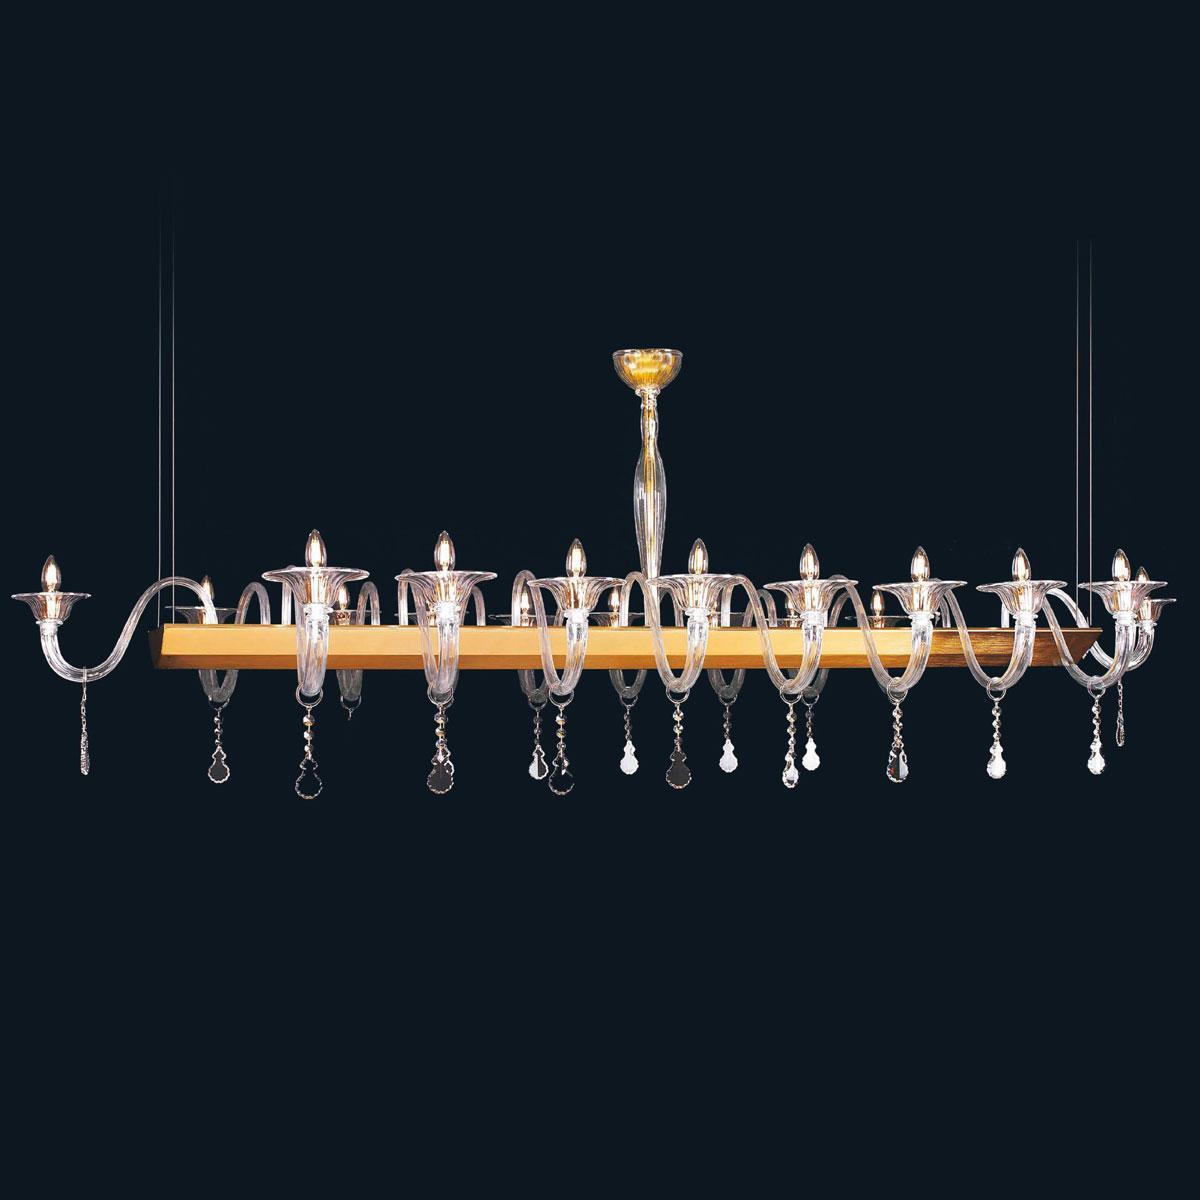 """Nadia"" lampara de araña de Murano - 18 luces - transparente"